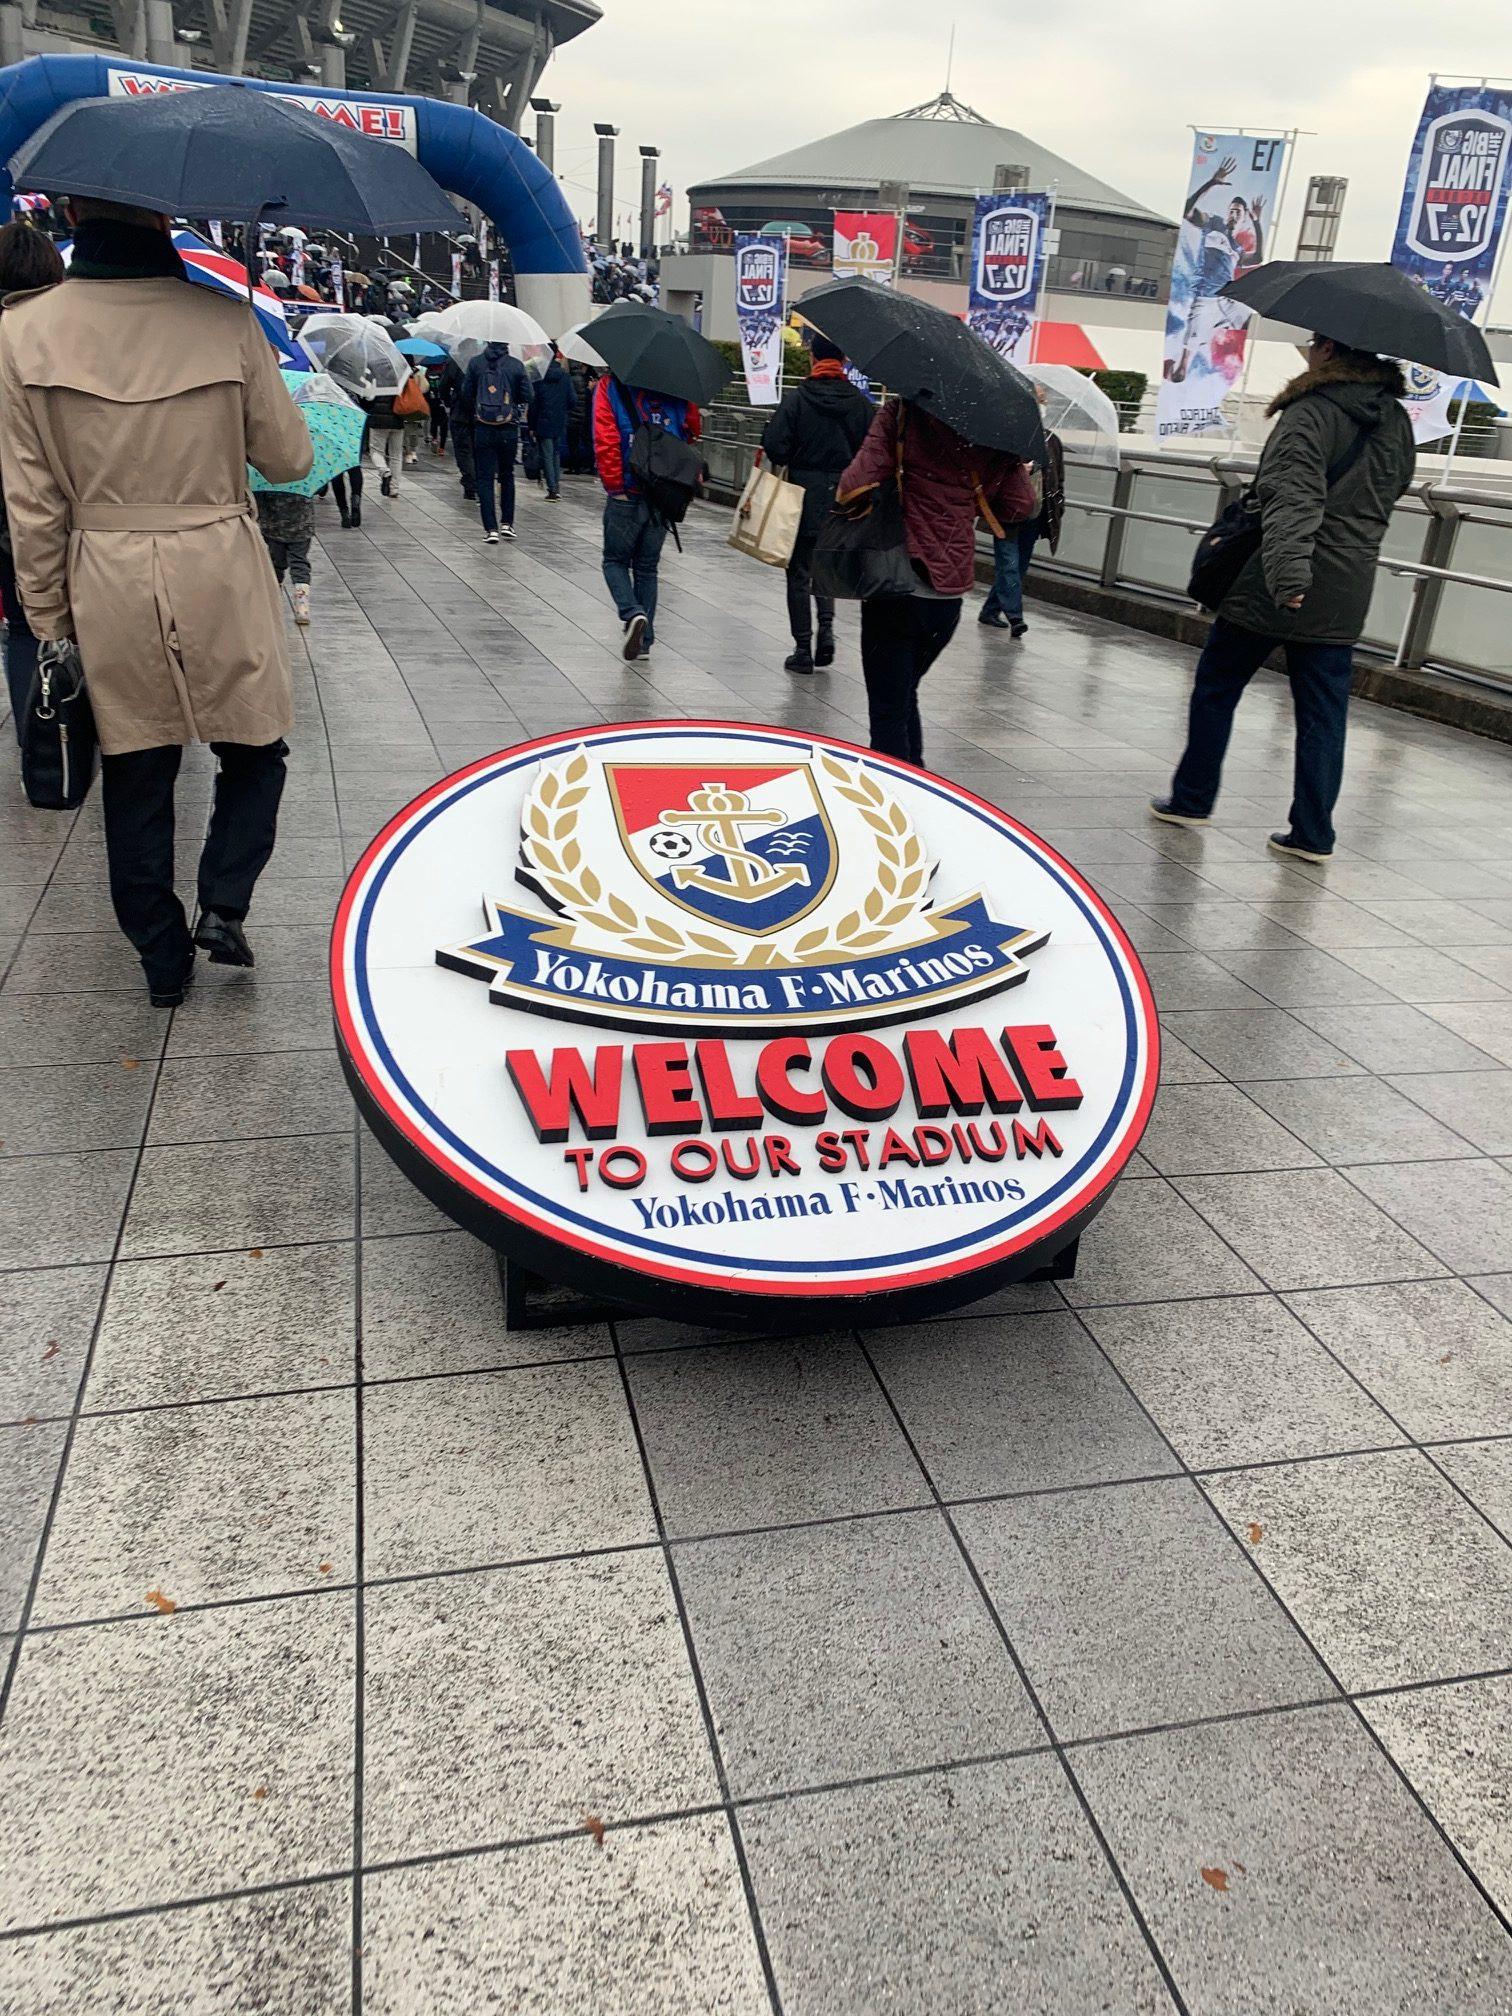 Jリーグ観戦記@2019/12/7〜横浜FマリノスVS FC東京〜